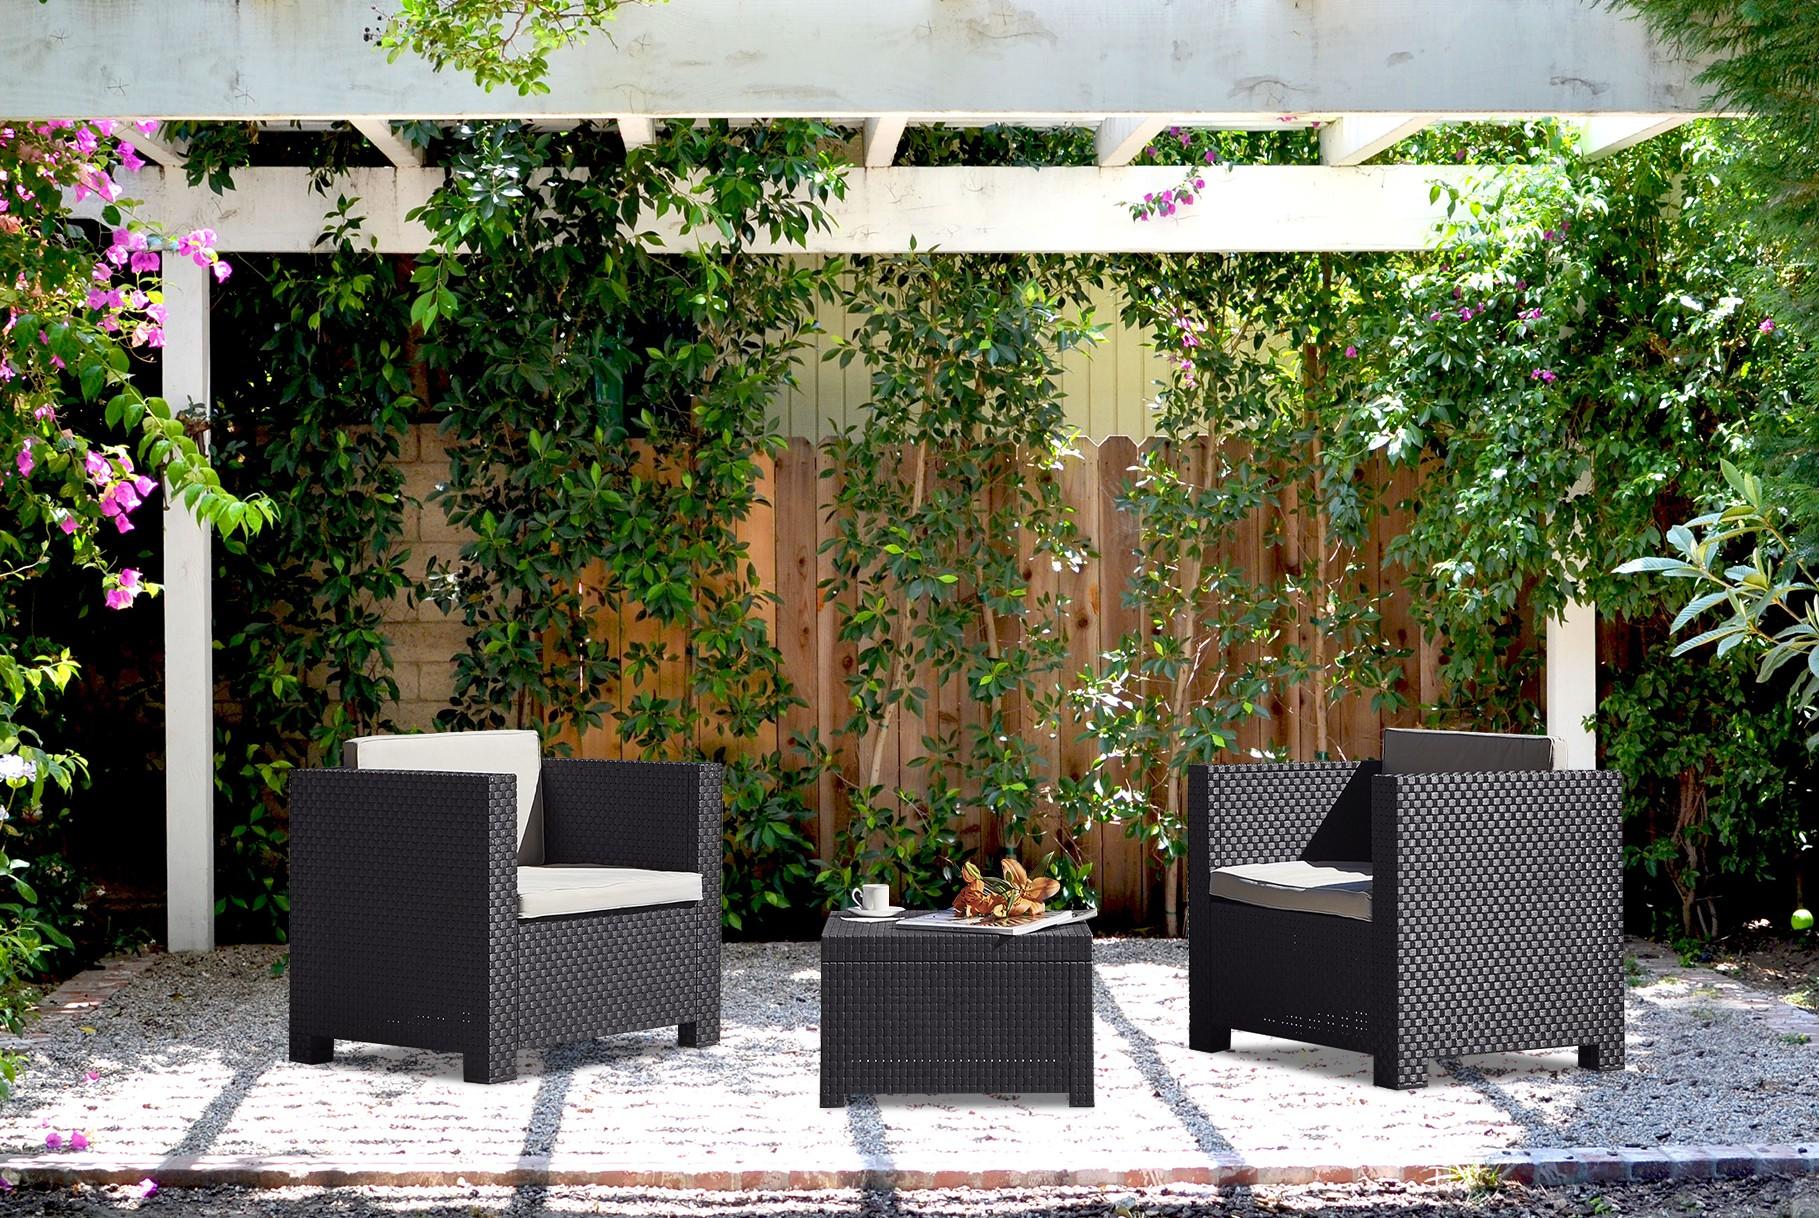 ubud 2 salon de jardin 2 places effet r sine tress e gris. Black Bedroom Furniture Sets. Home Design Ideas